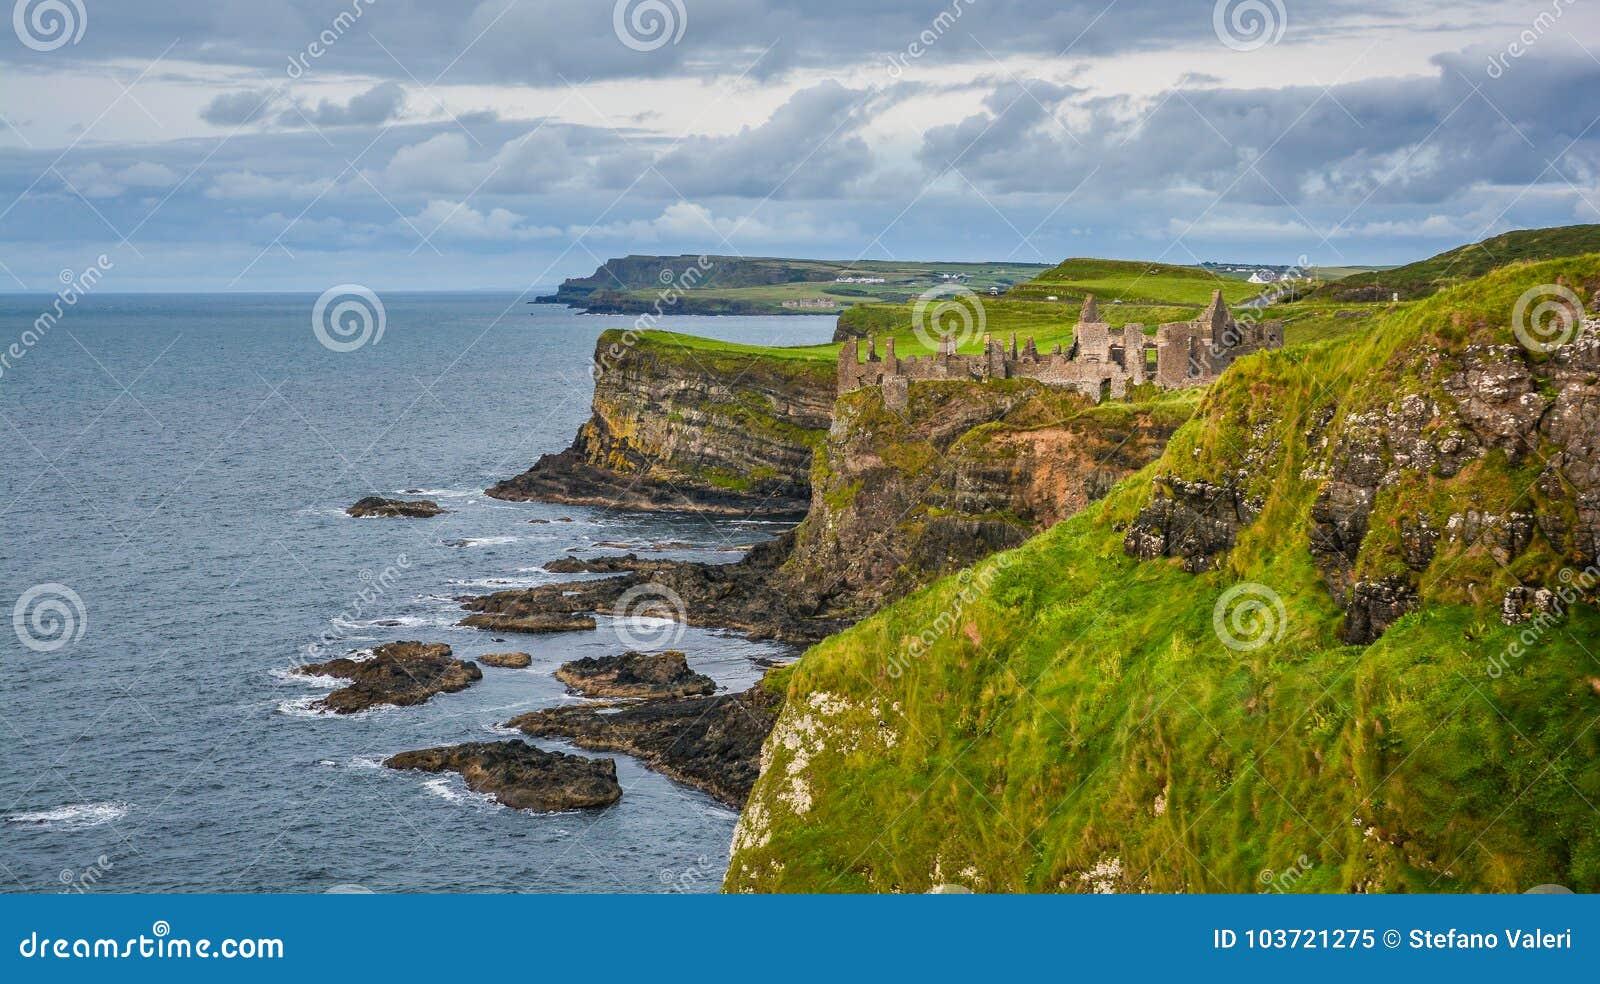 Dunluce Castle, County Antrim, Ireland.